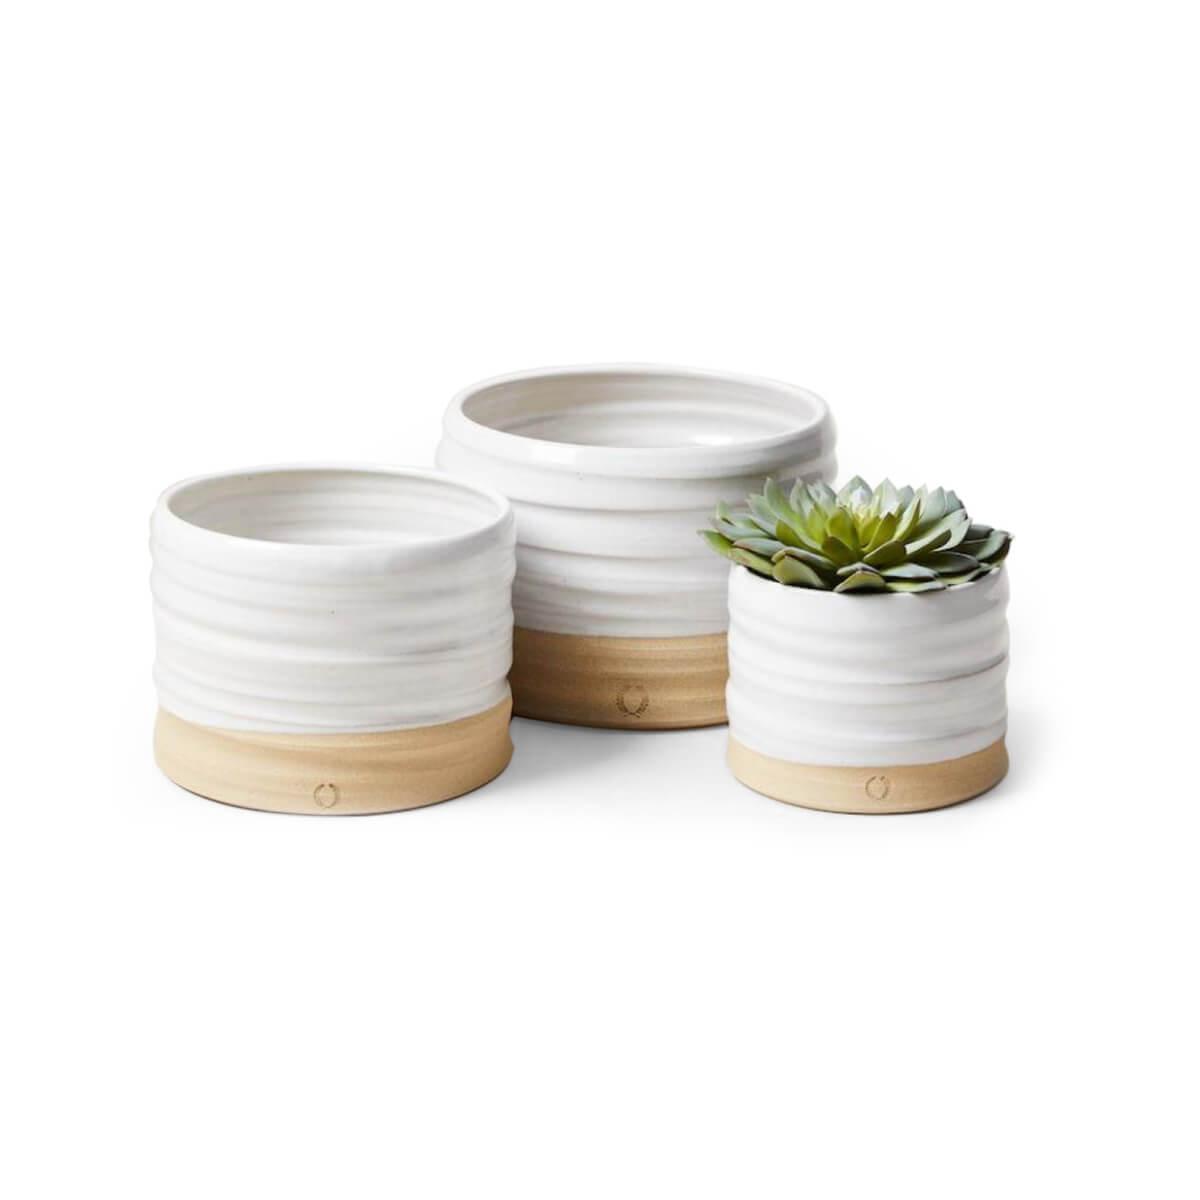 Farmhouse Pottery Pots